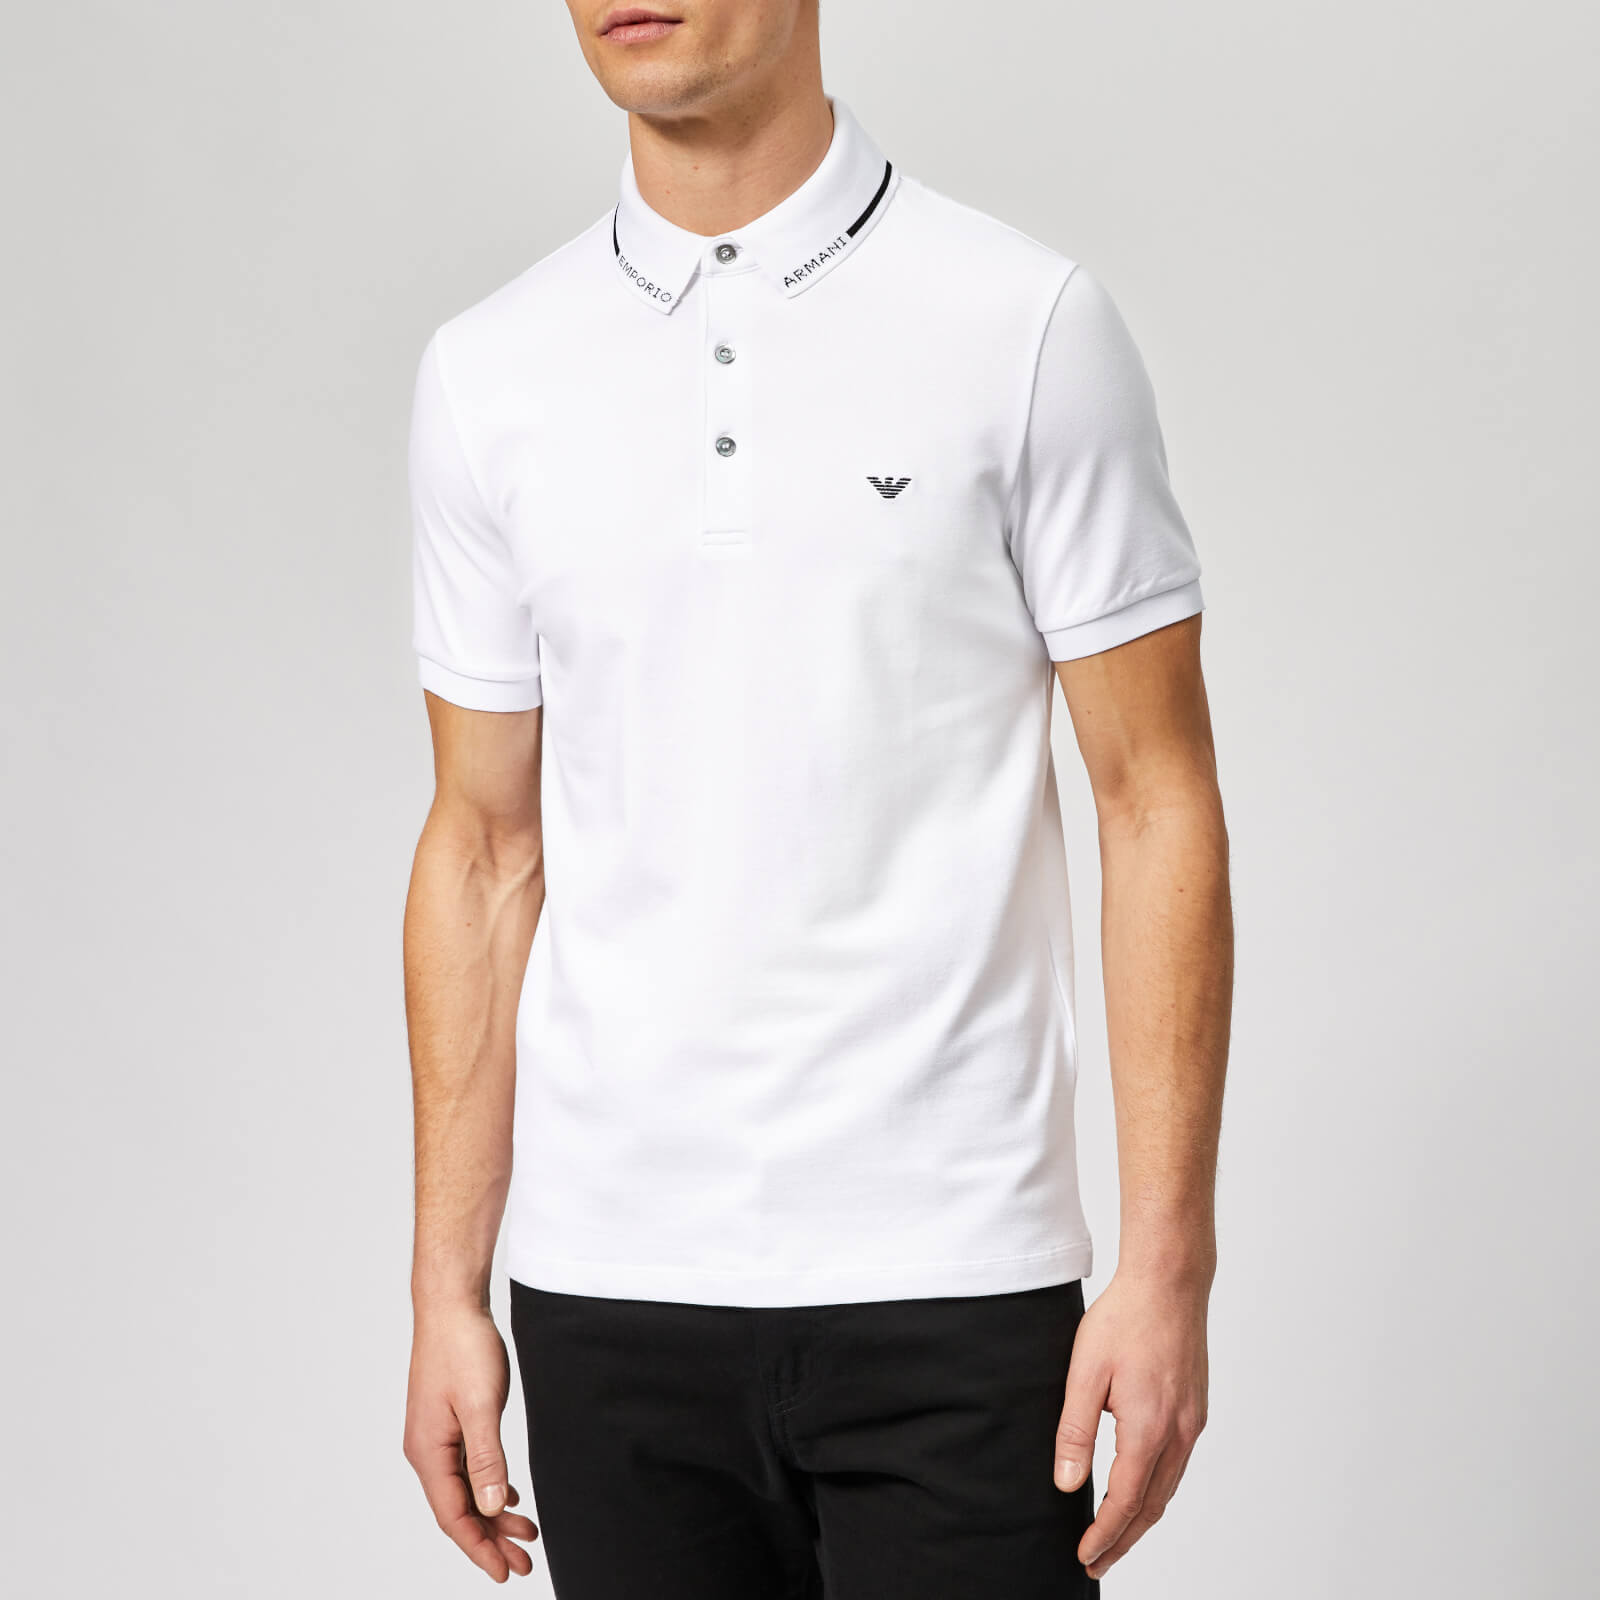 72c555aeee Emporio Armani Men's Collar Logo Polo Shirt - Bianco Ottico